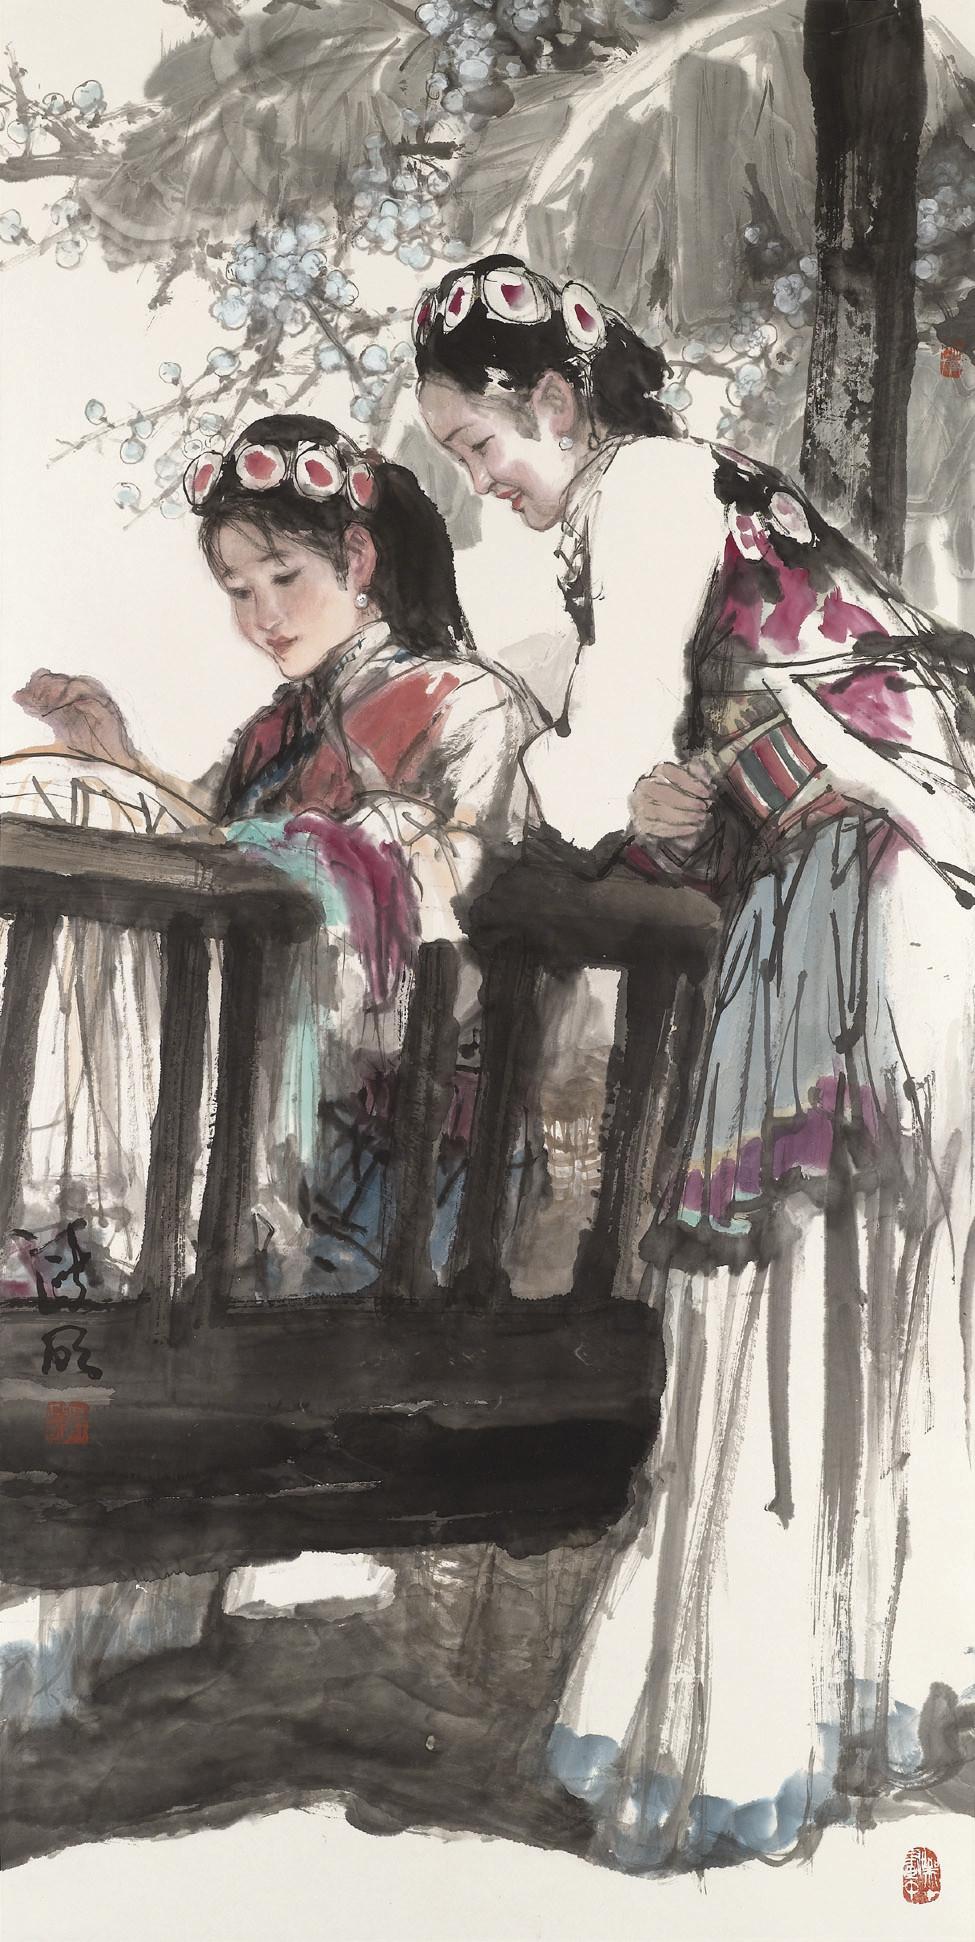 CHEN ZHENGMING (BORN 1941)